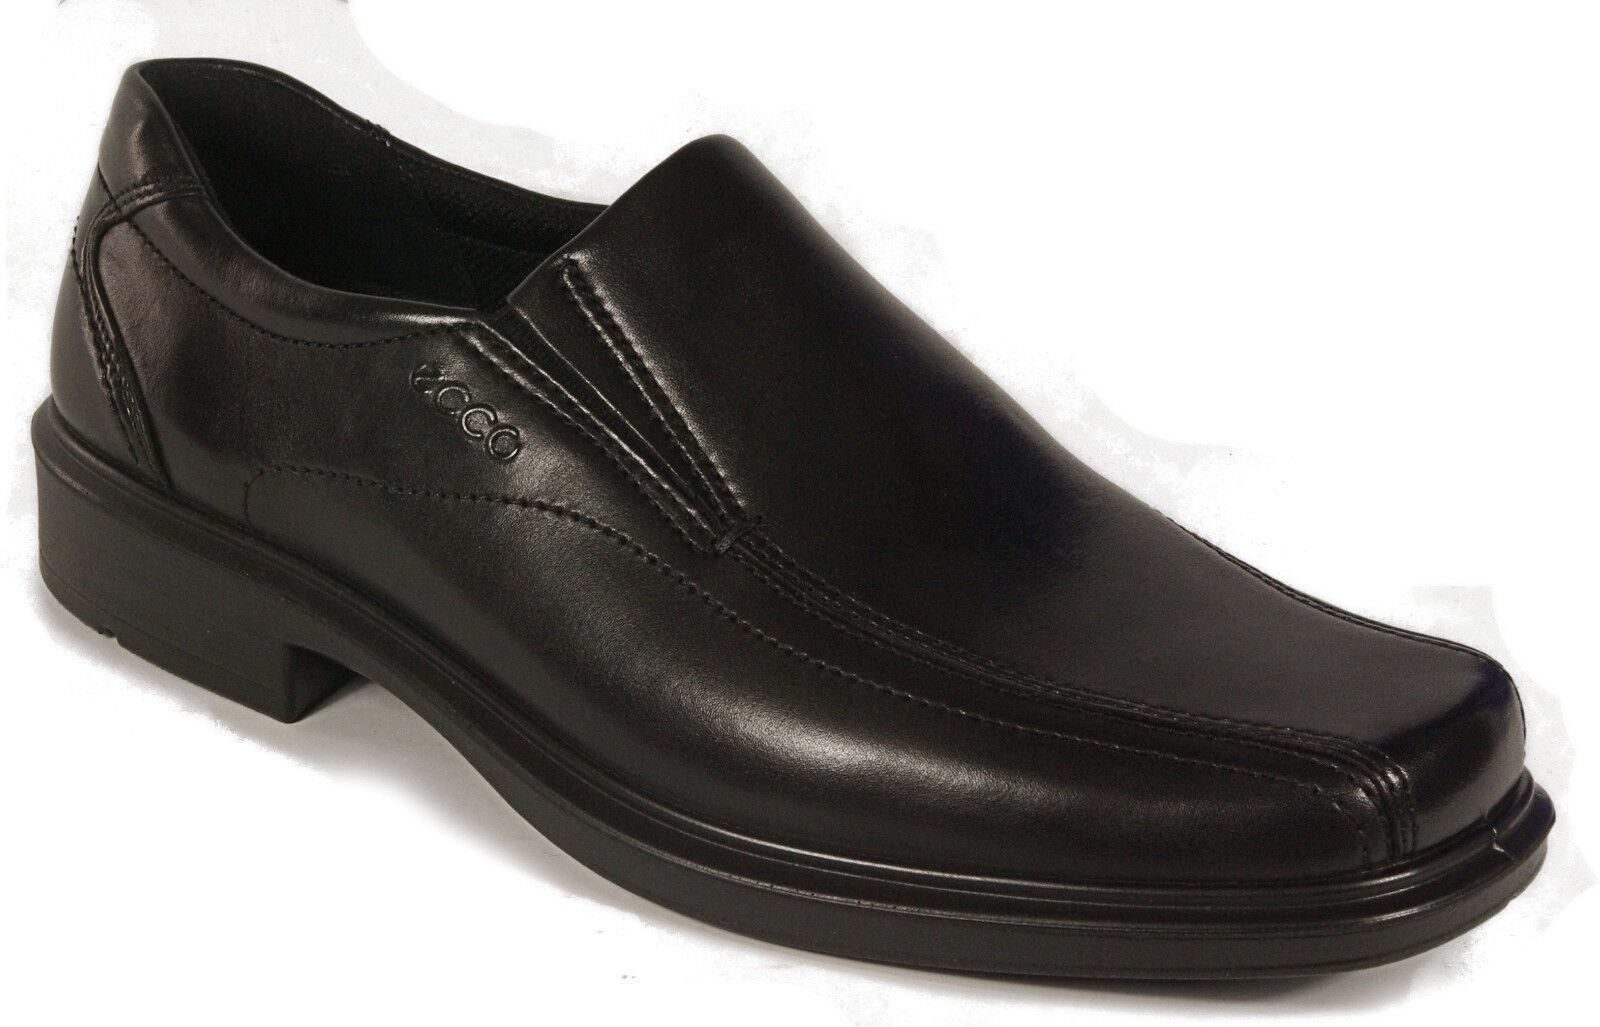 ECCO man shoes model HELSINKI slip ons leather NEW